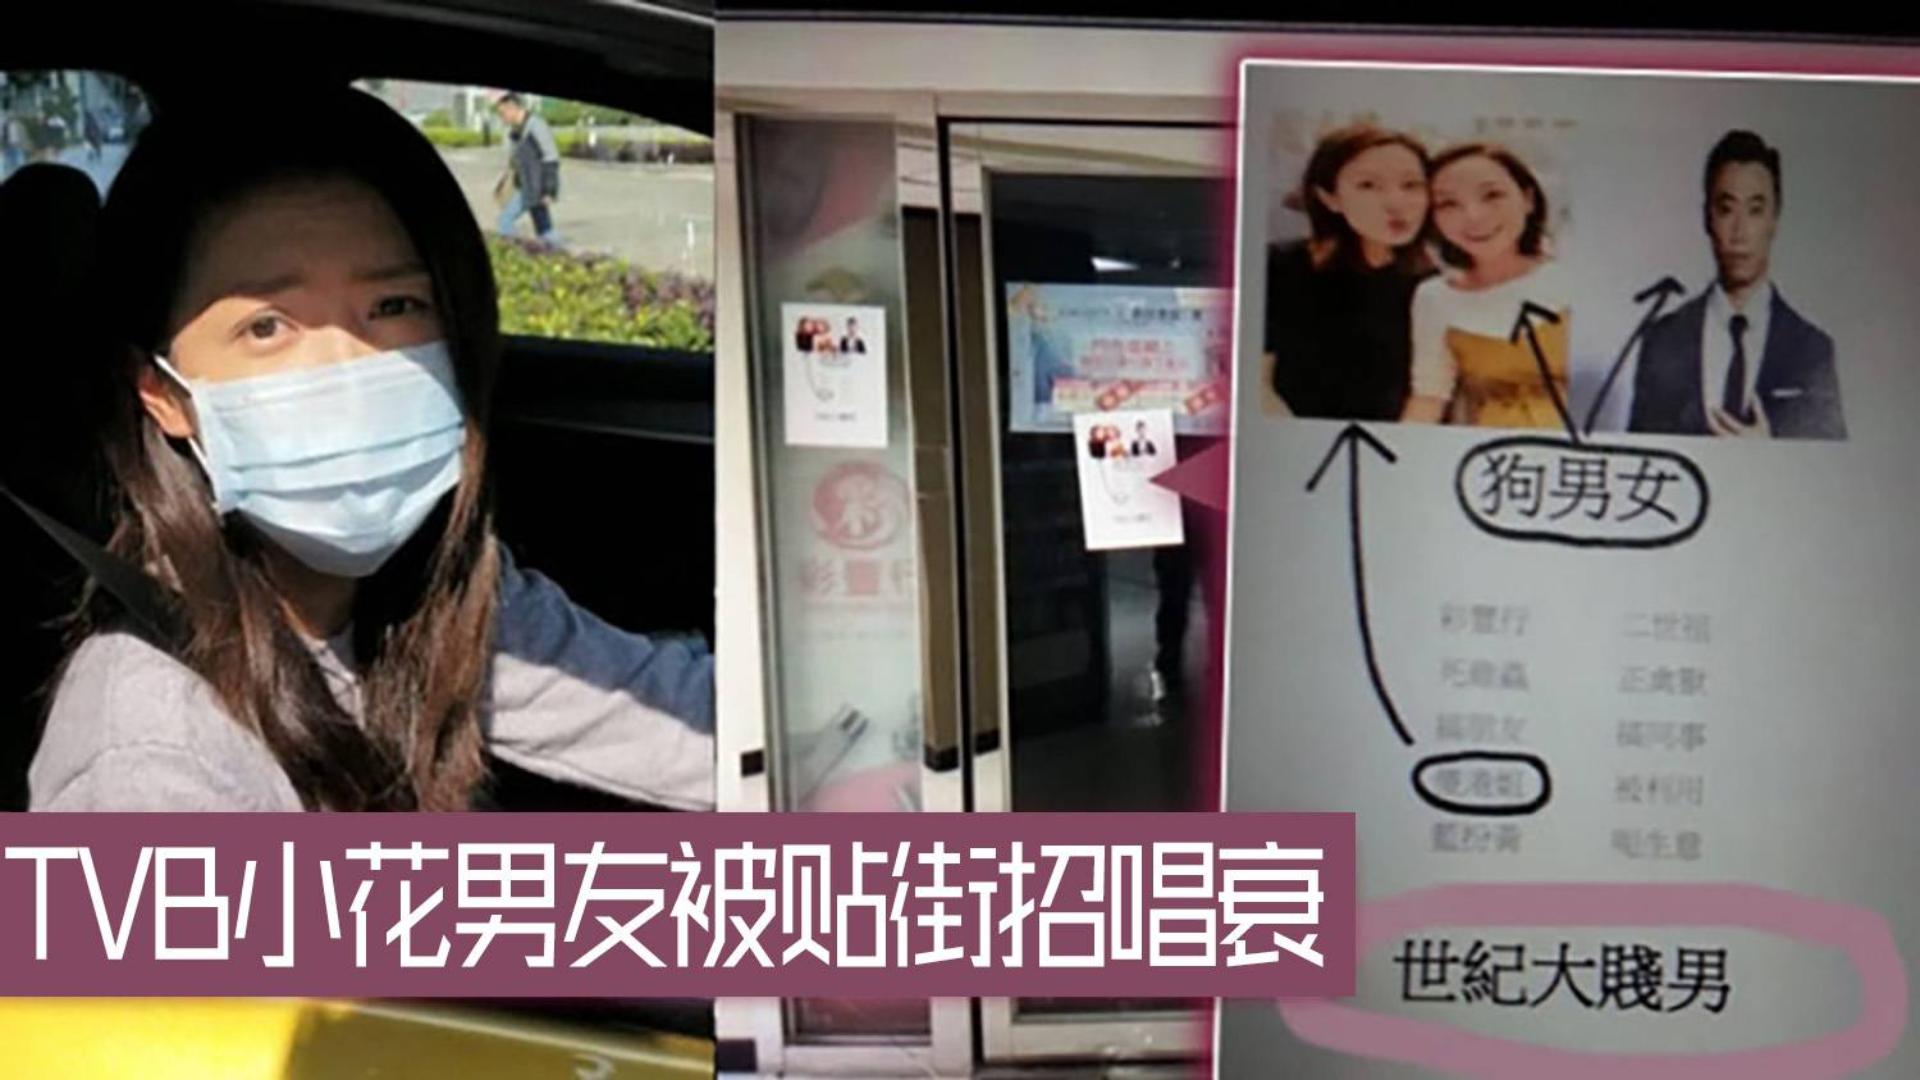 TVB小花男友疑偷食 被贴街招唱衰:狗男女!